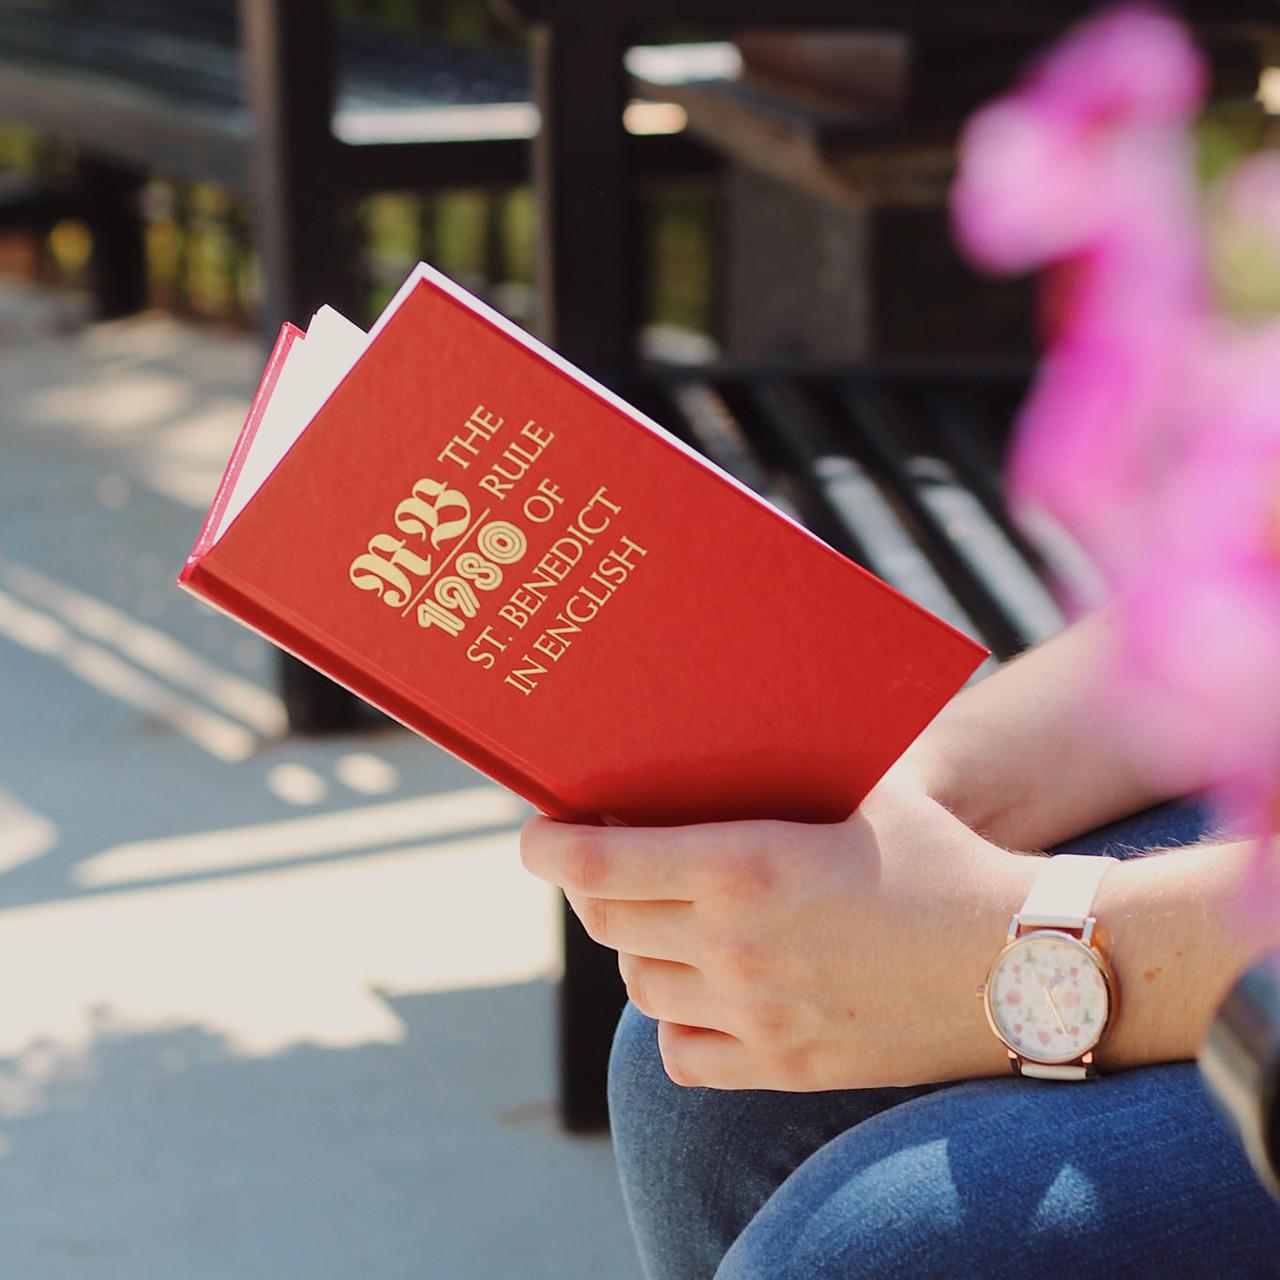 Books & Bibles